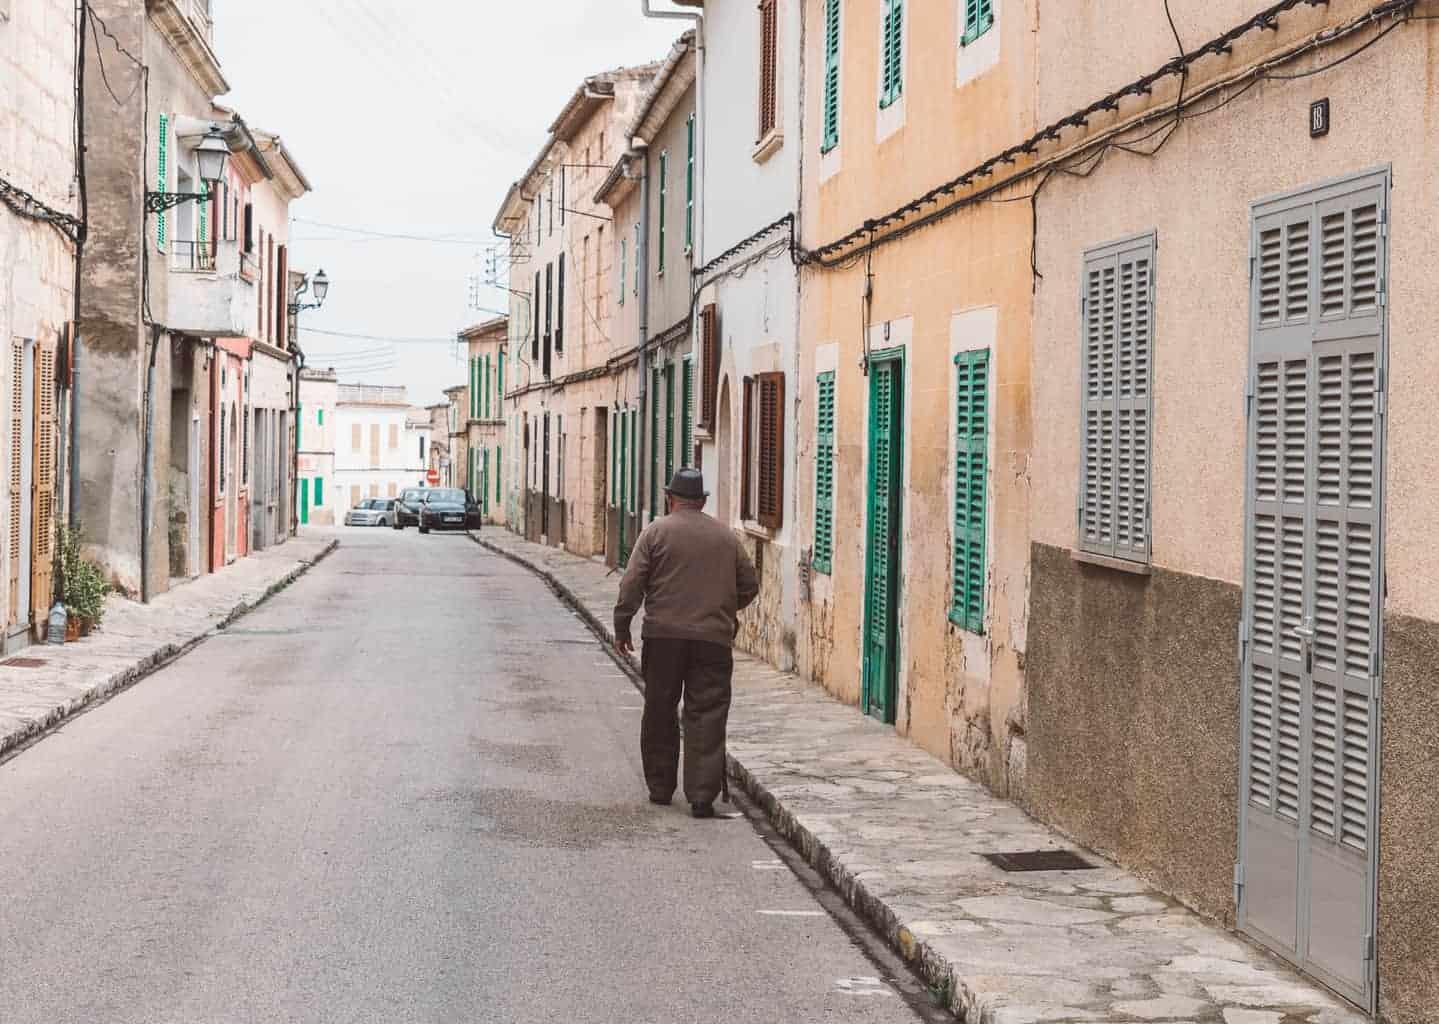 Village Streets of Mallorca